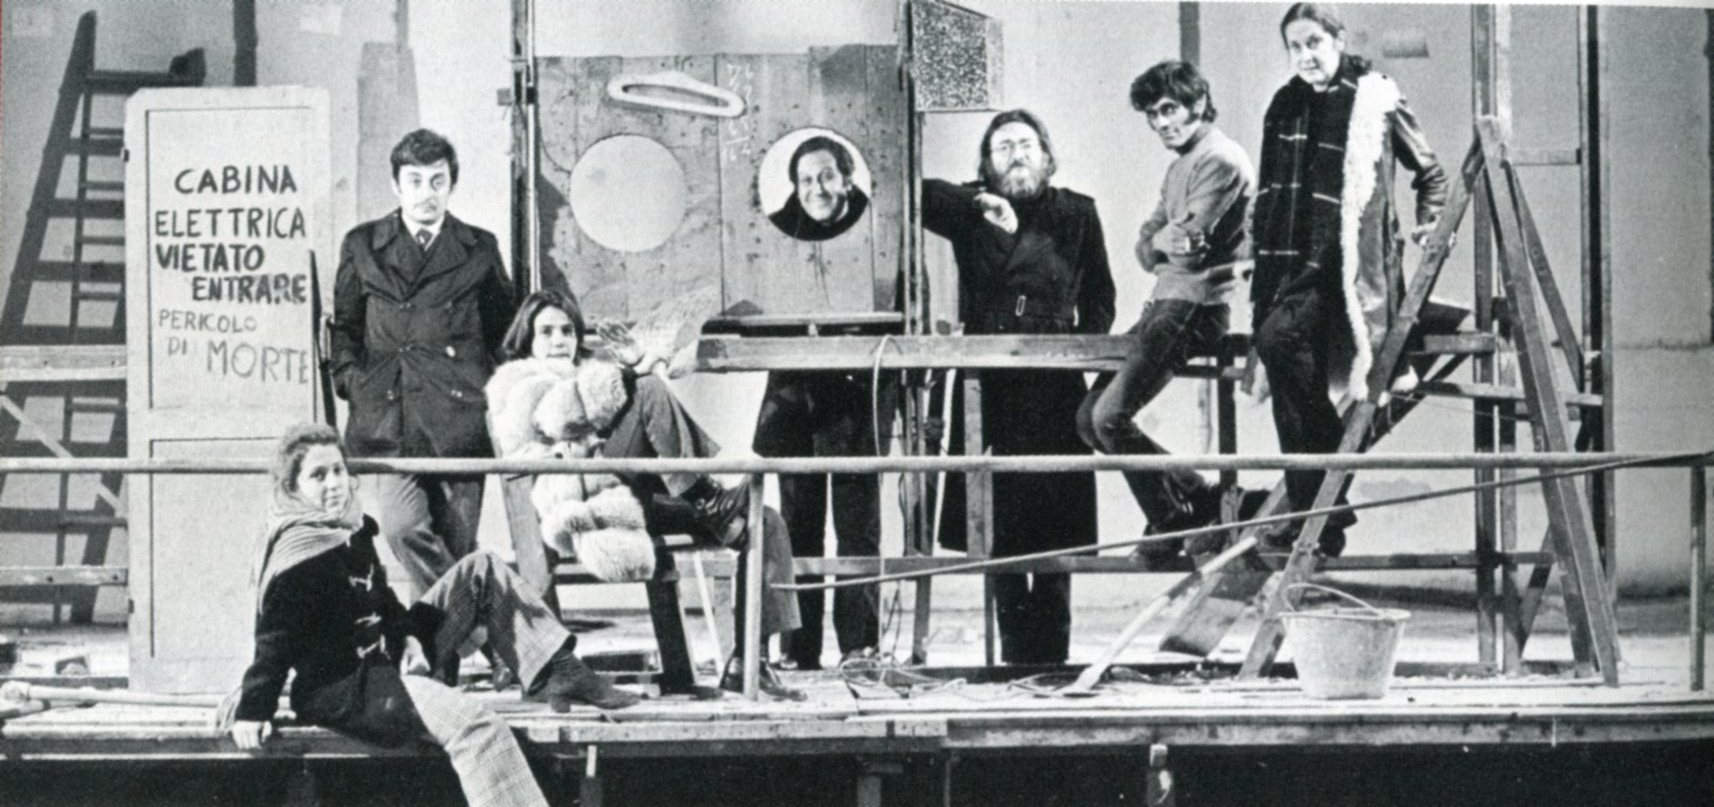 Andrée Ruth Shammah, Franco Parenti, Luisa Rossi